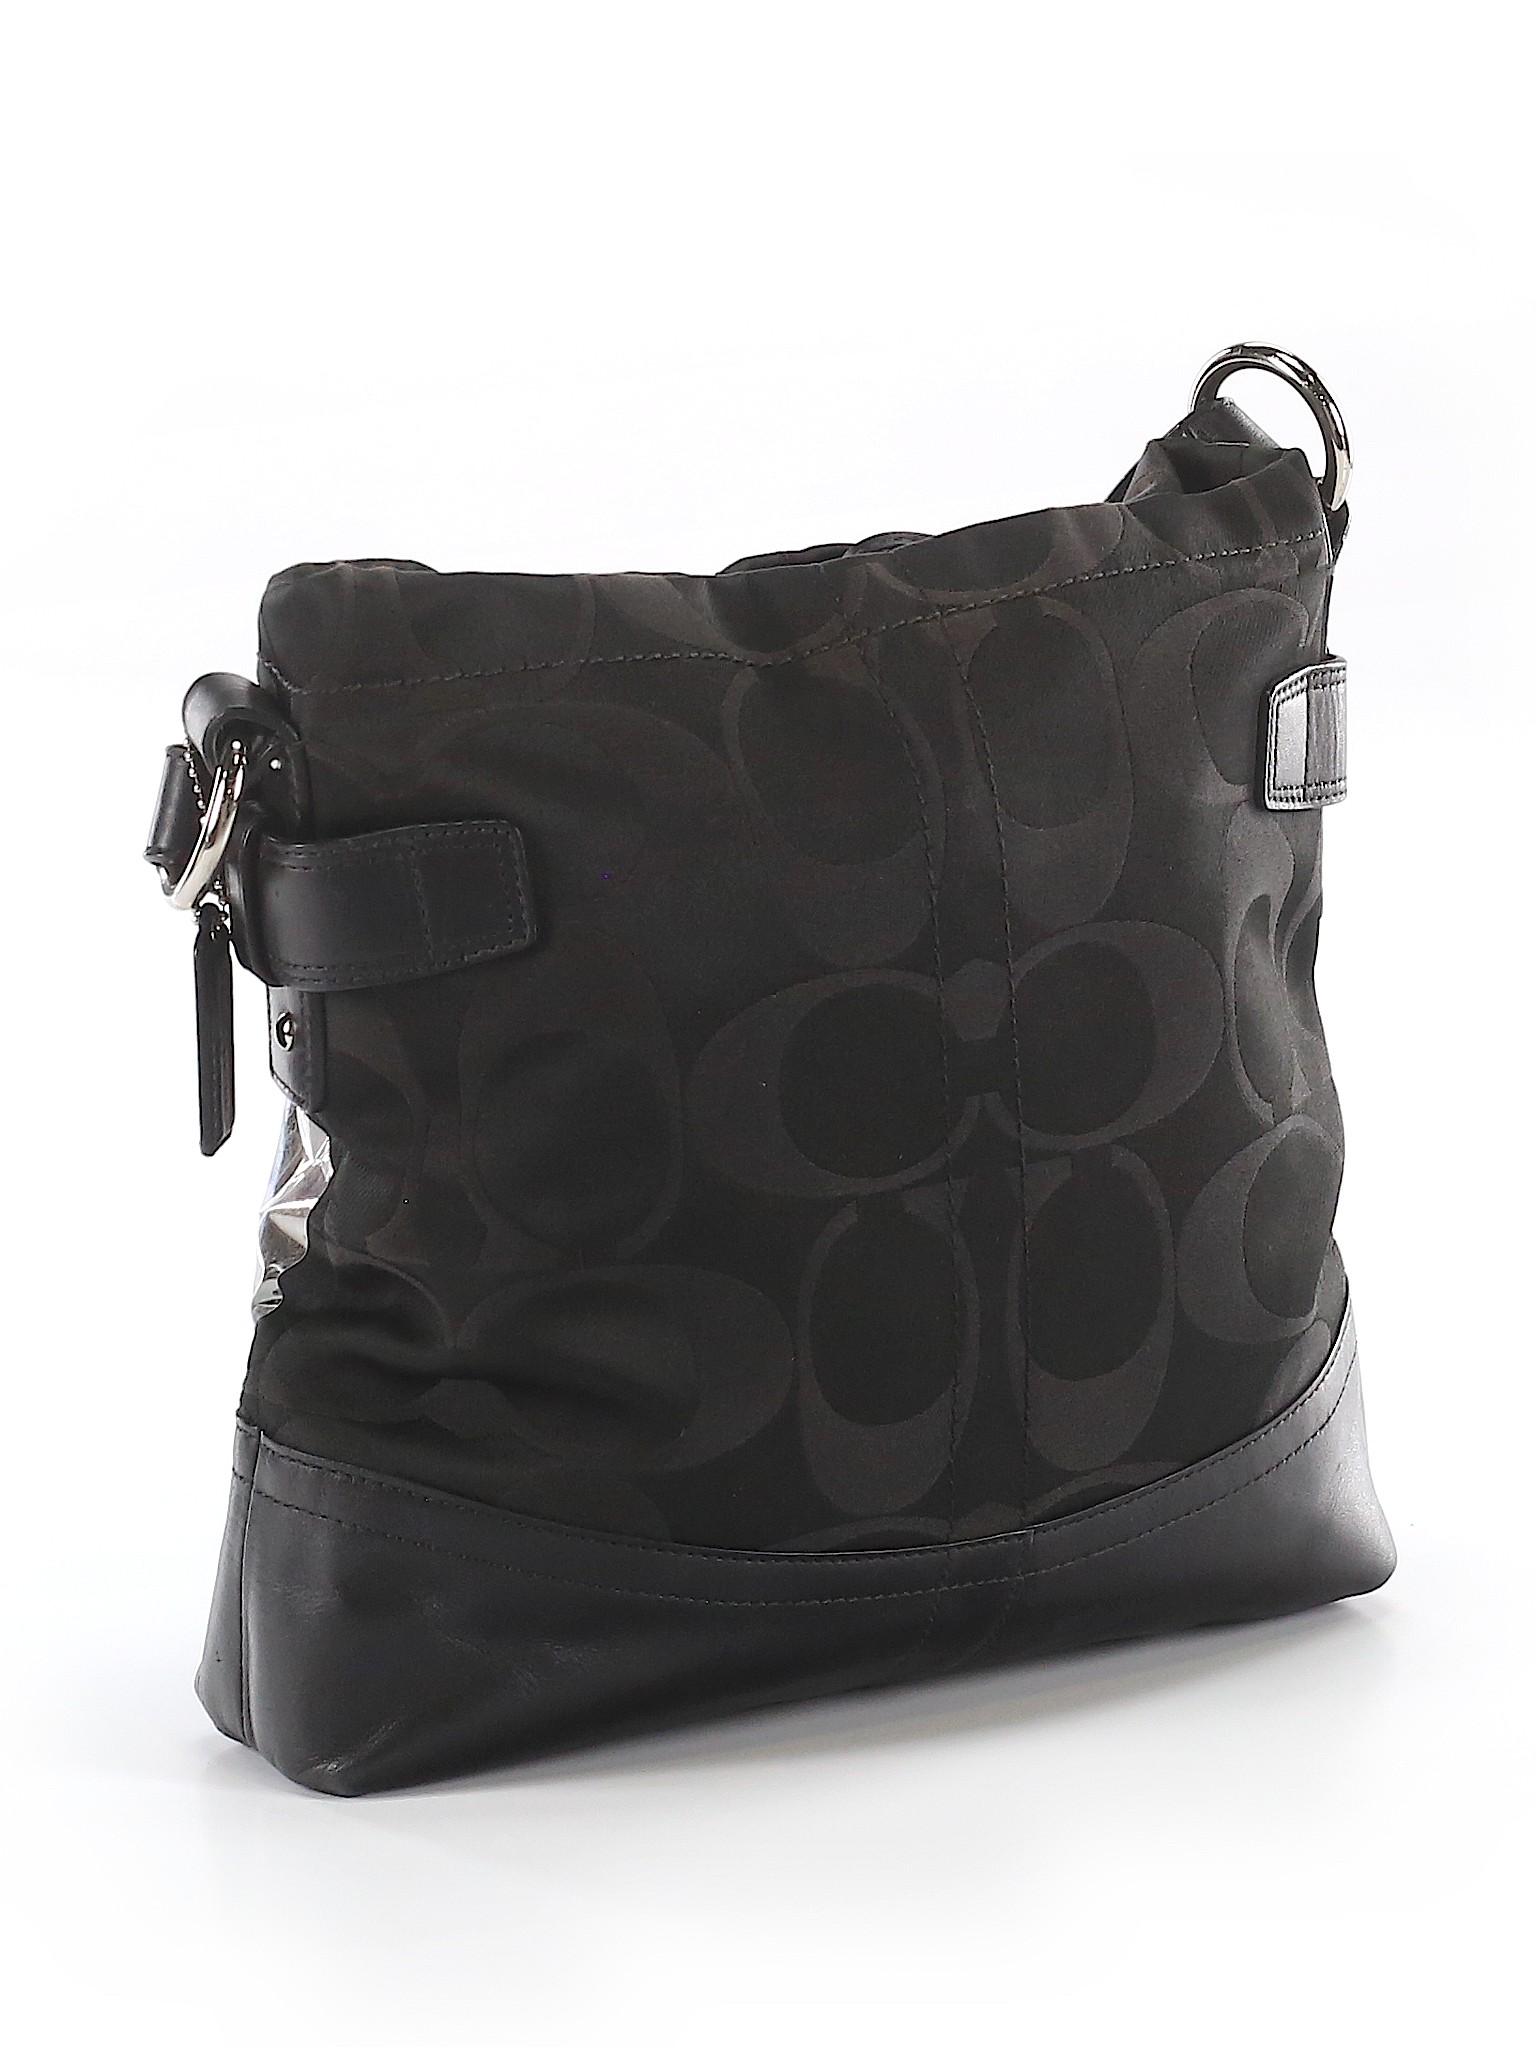 a4132e935ba2 Handbags   Purses  New   Used On Sale Up to 90% Off